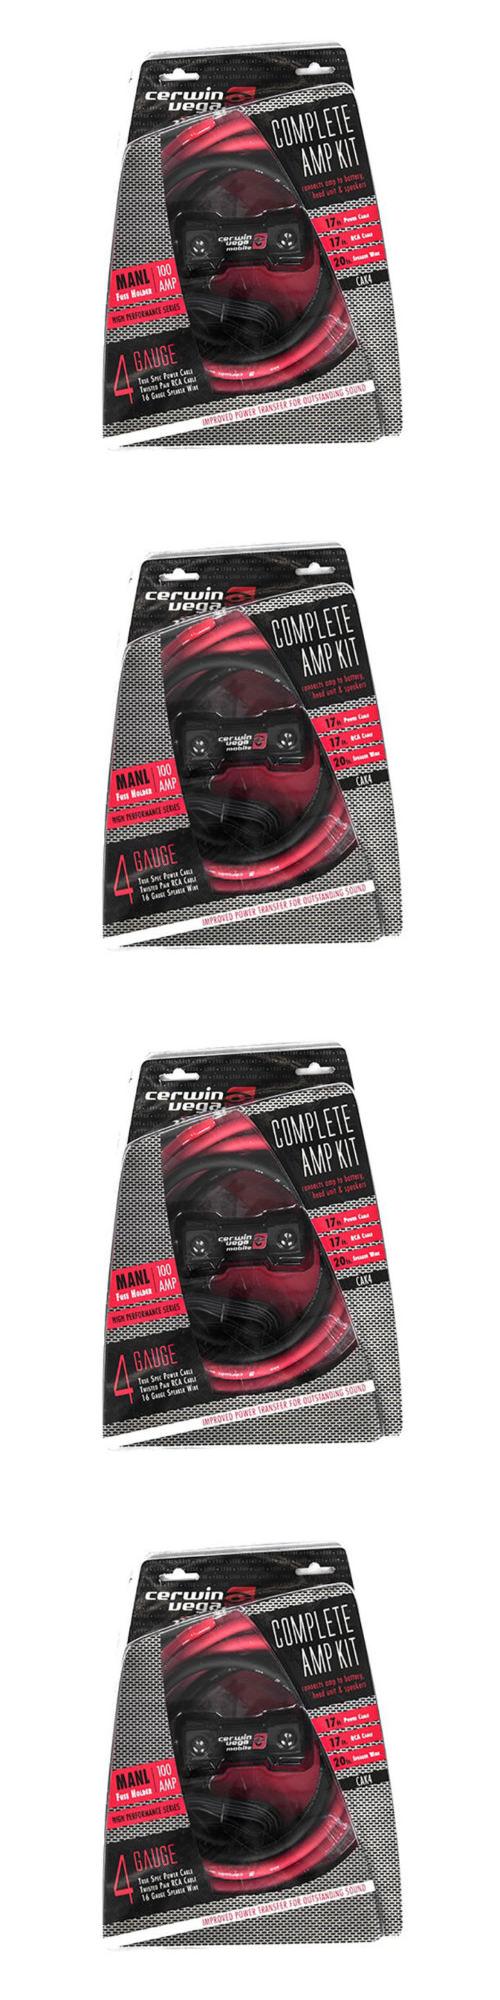 Amplifier Kits Cerwin Vega 4ga Complete Car Cak4 Buy Gauge Amp Installation Power Wiring Kit Ofc Ebay It Now Only Amplifierebay